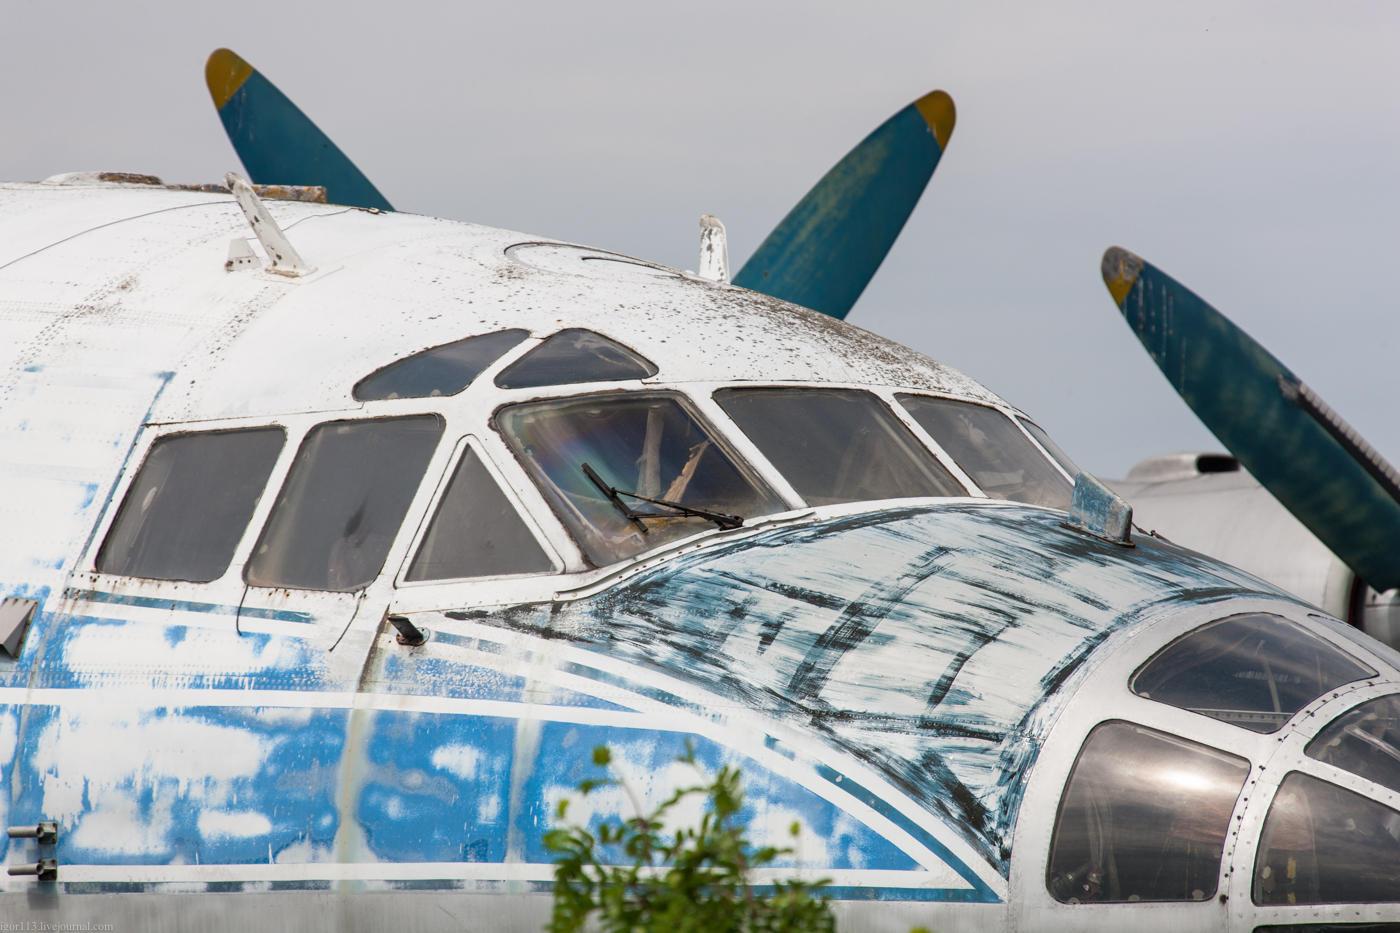 схема сборки модели самолета chepmunk t-10